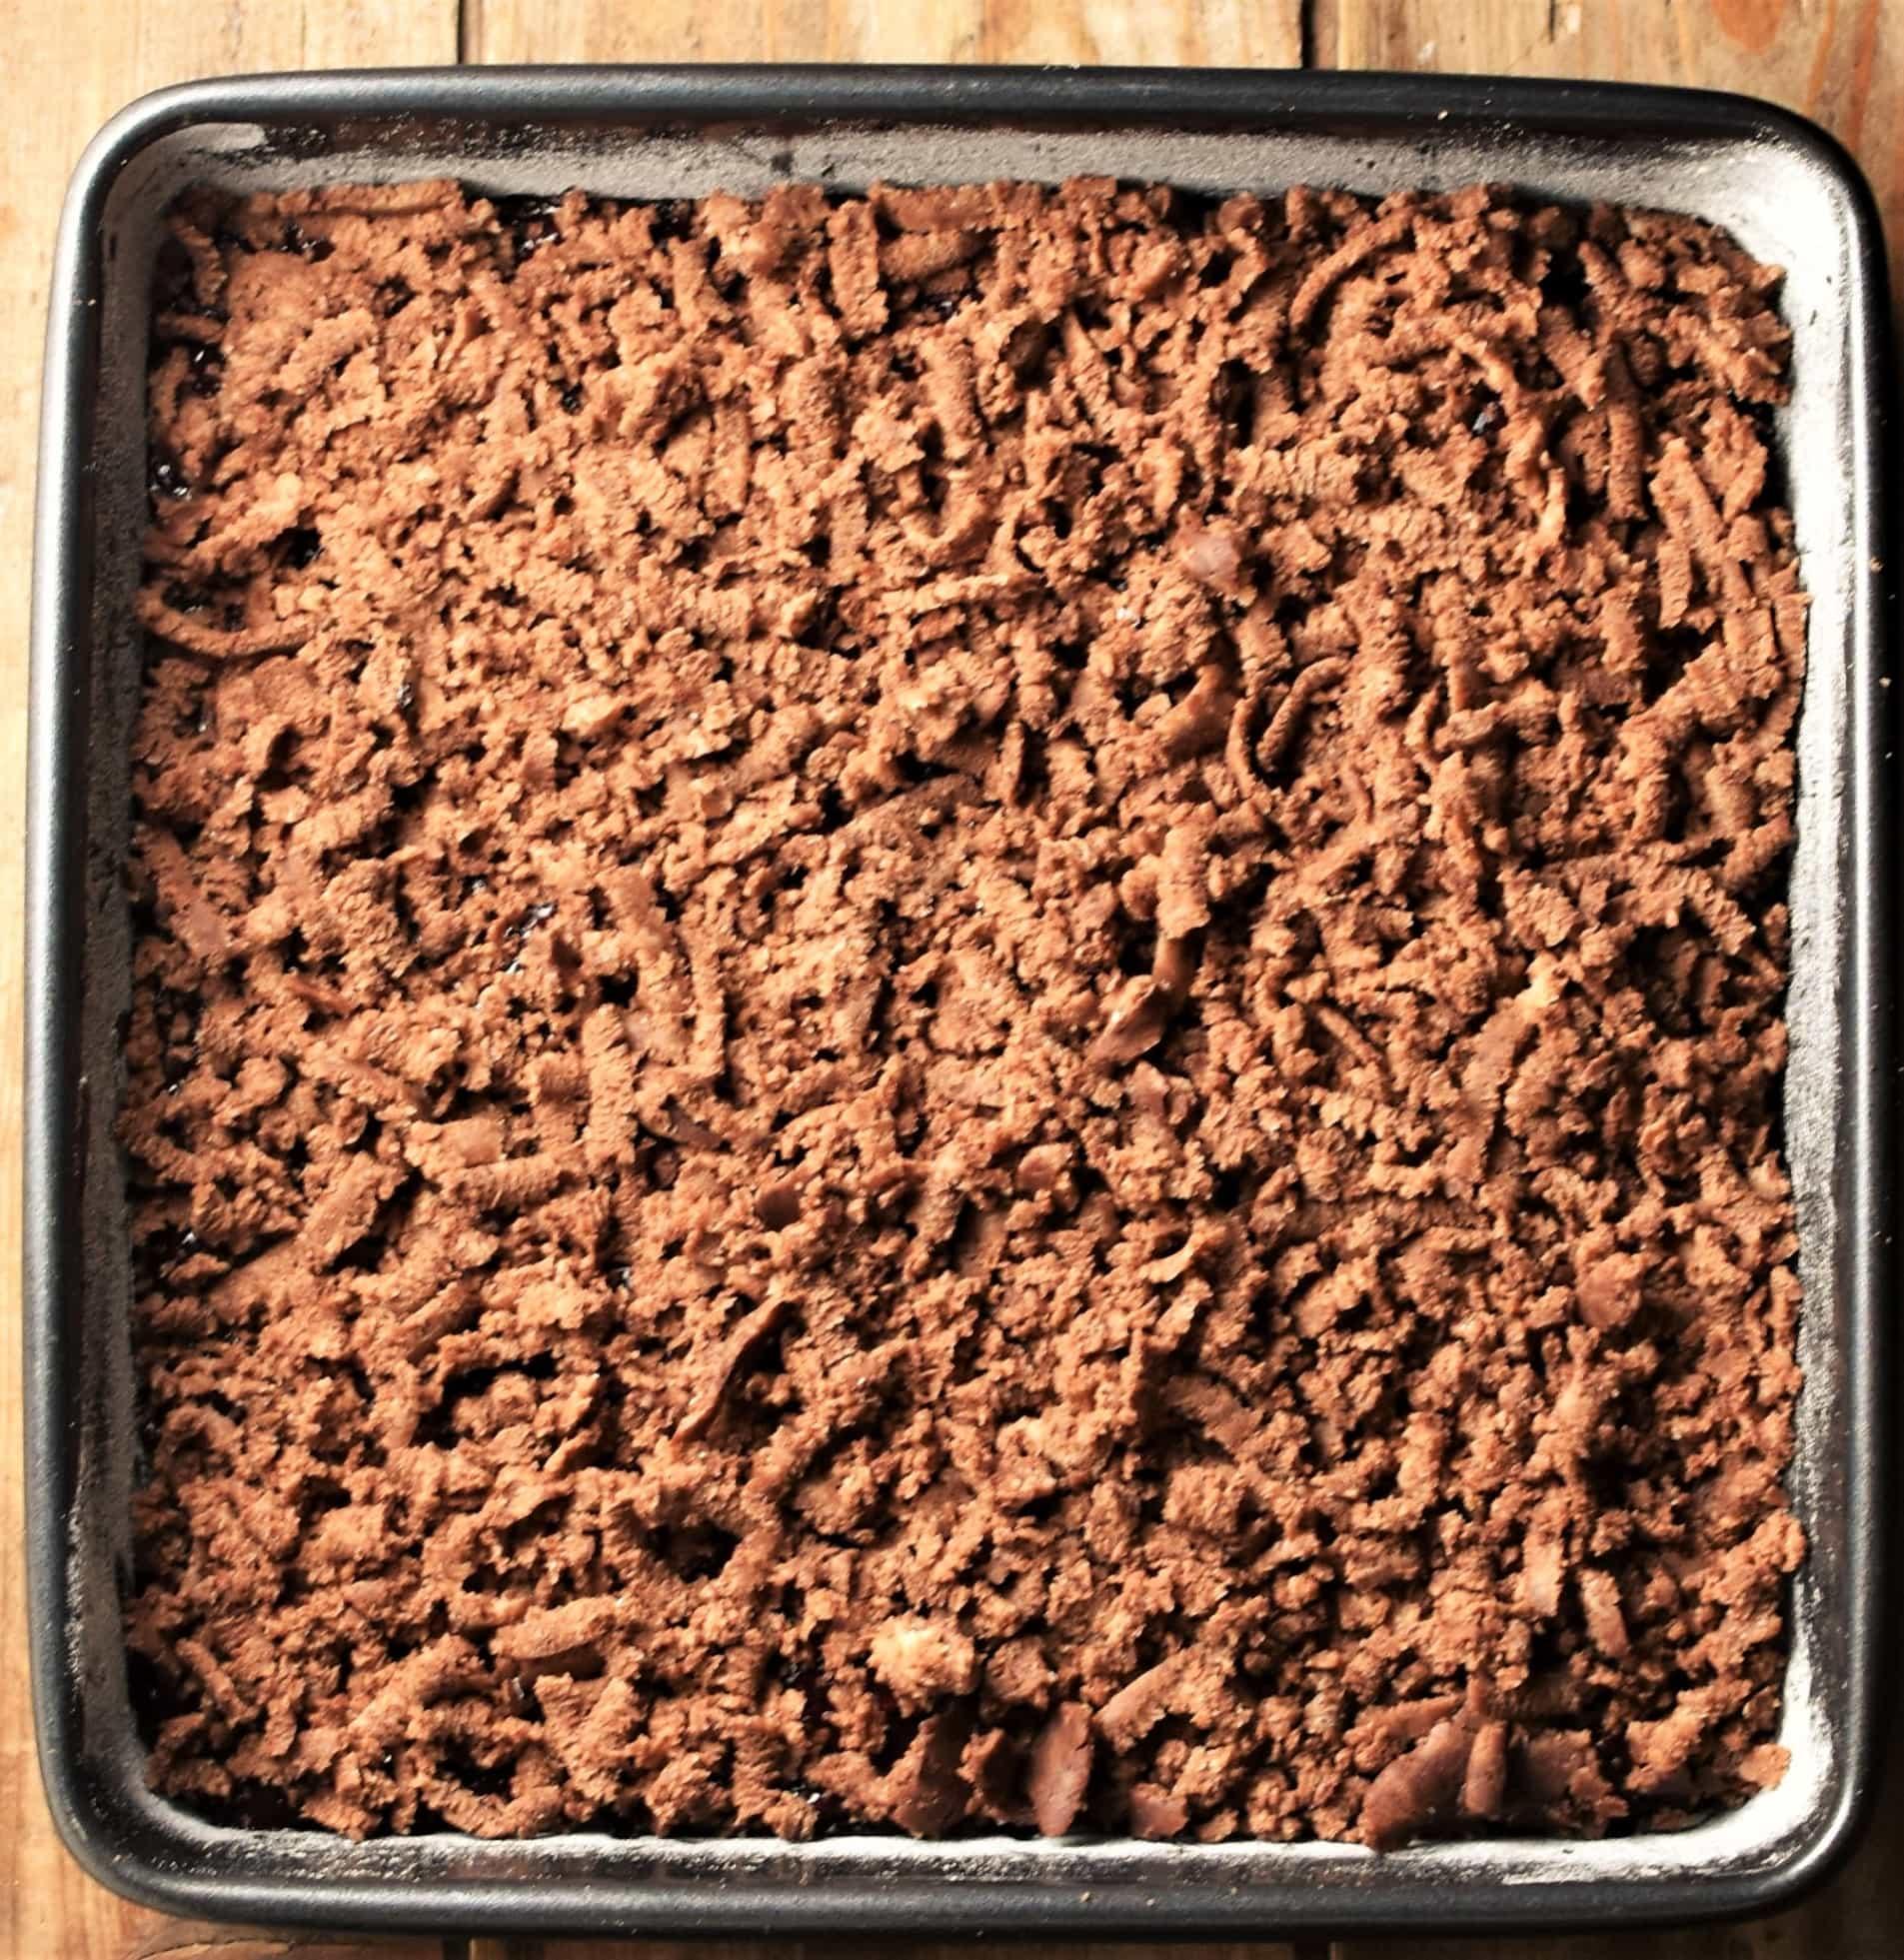 Cocoa crumb layer in square pan.